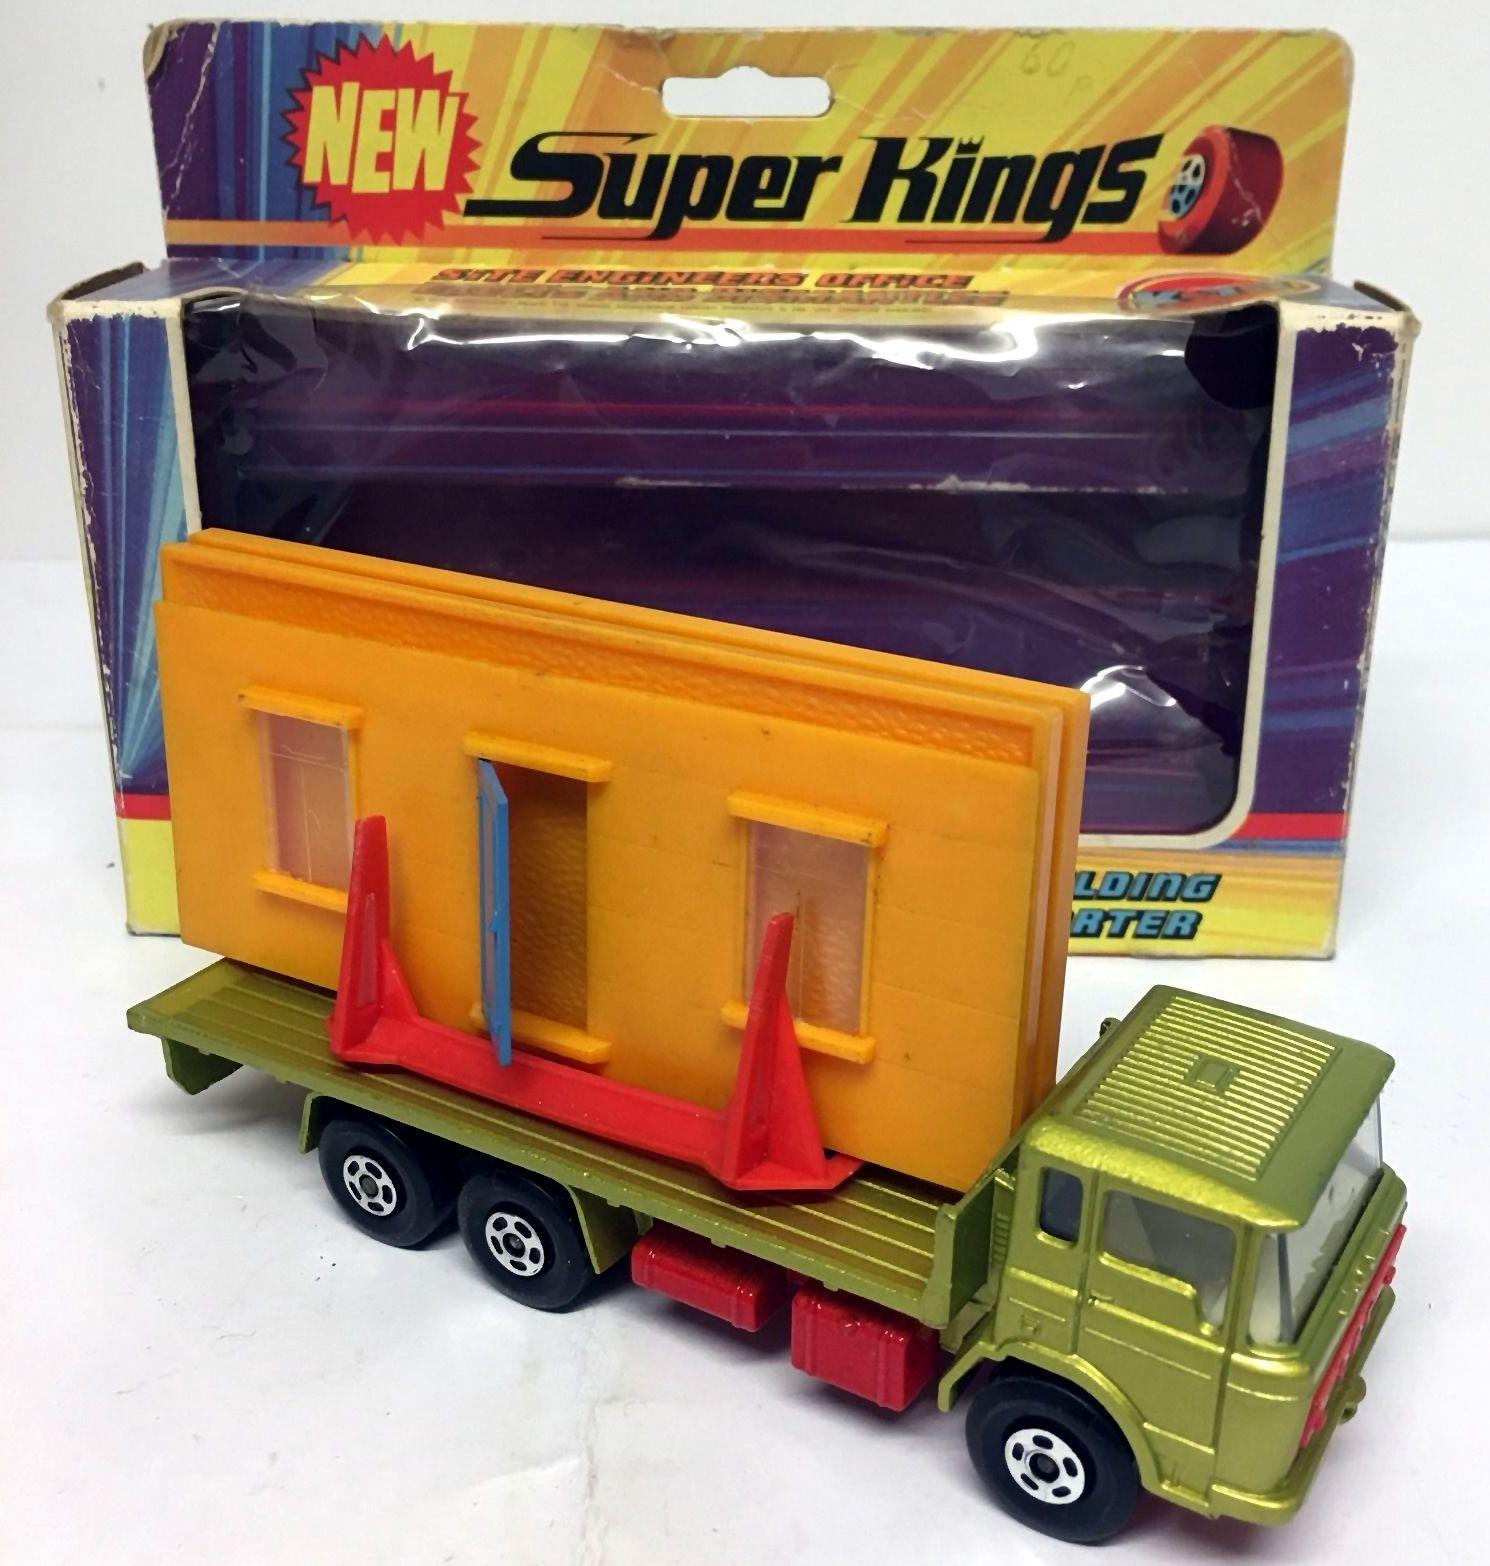 D.A.F. Building Transporter (K-13)